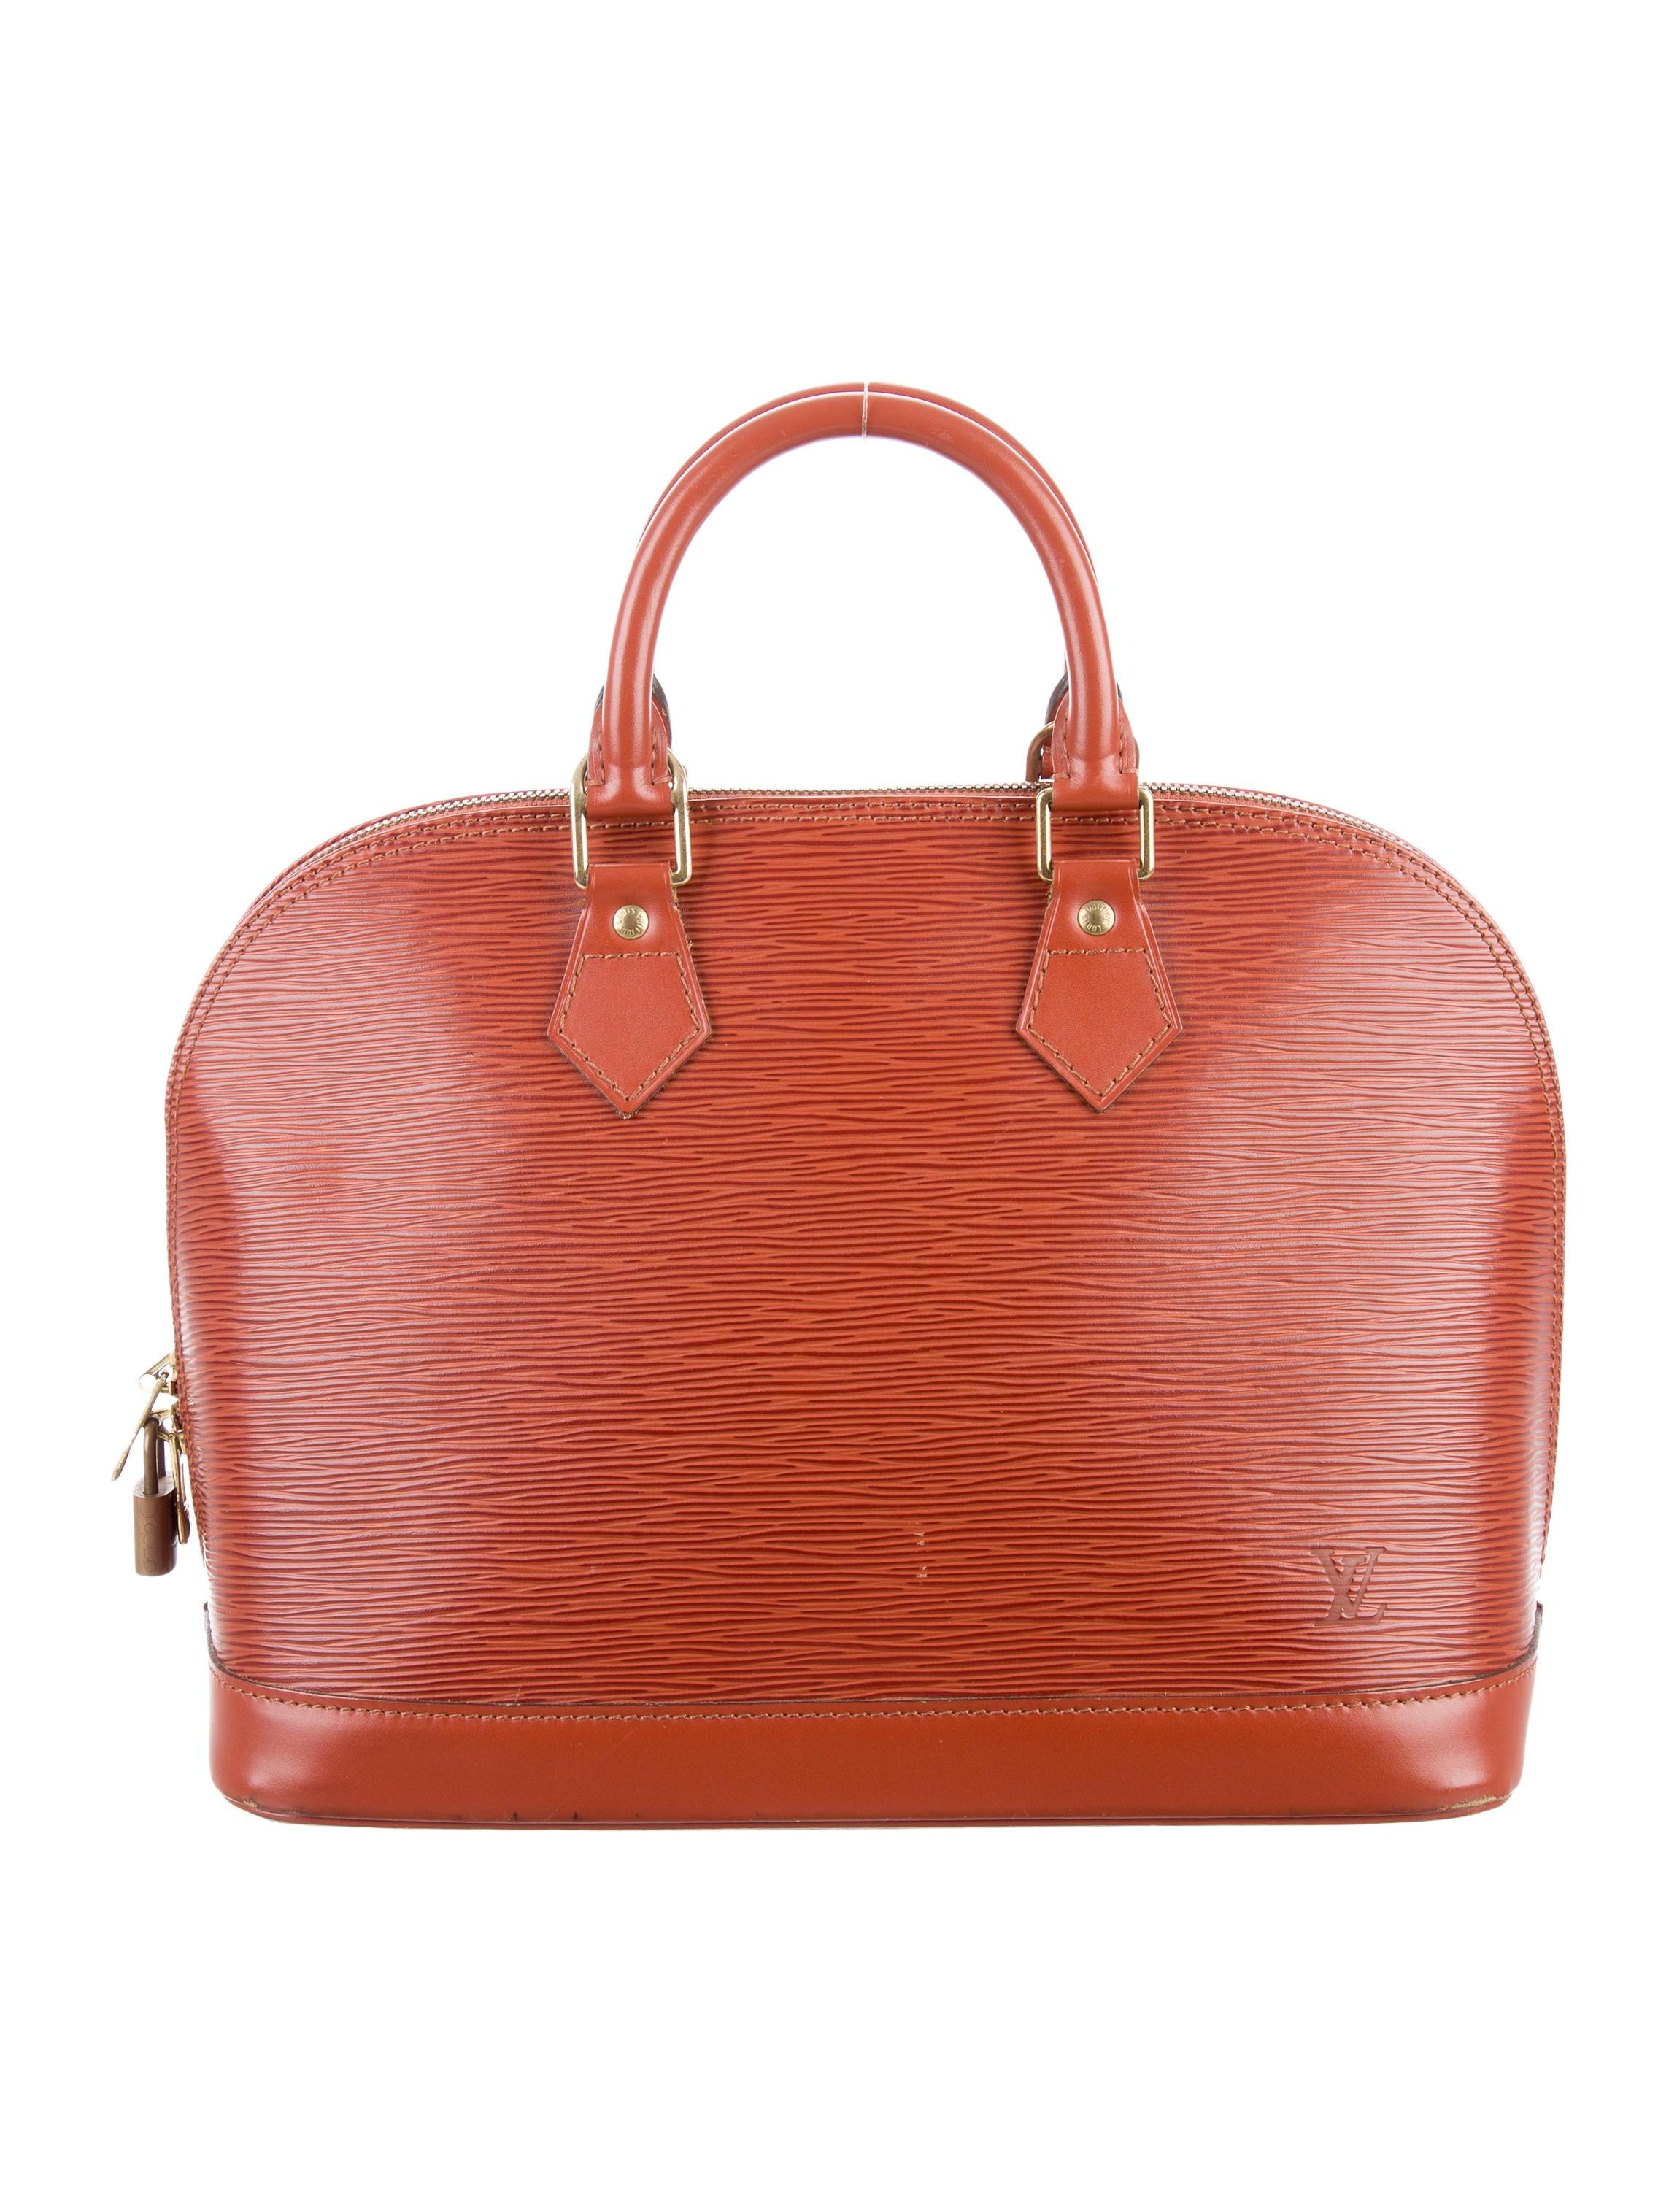 Louis vuitton epi alma pm handbags lou119072 the for Louis vuitton miroir alma bag price